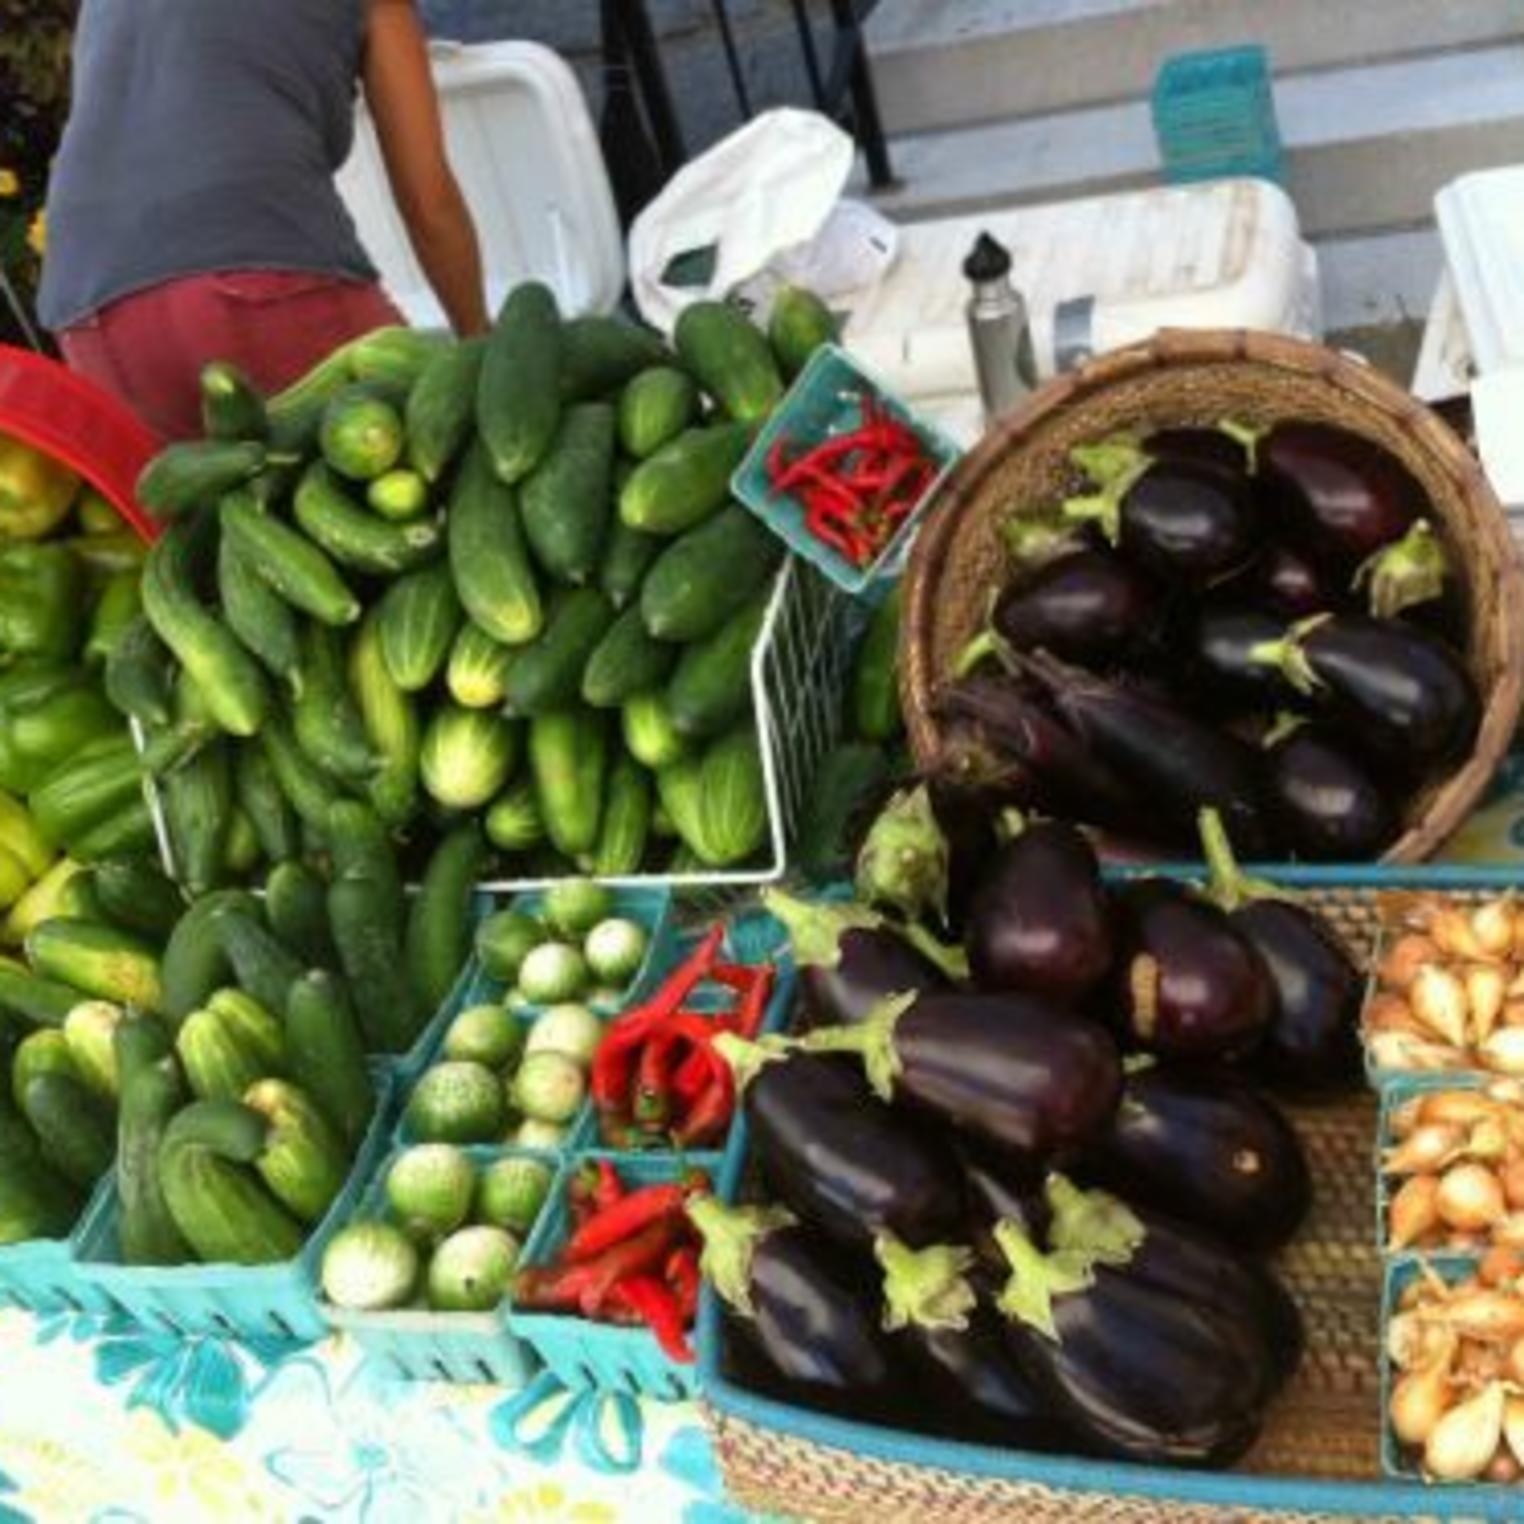 Produce at Everblossom Farm